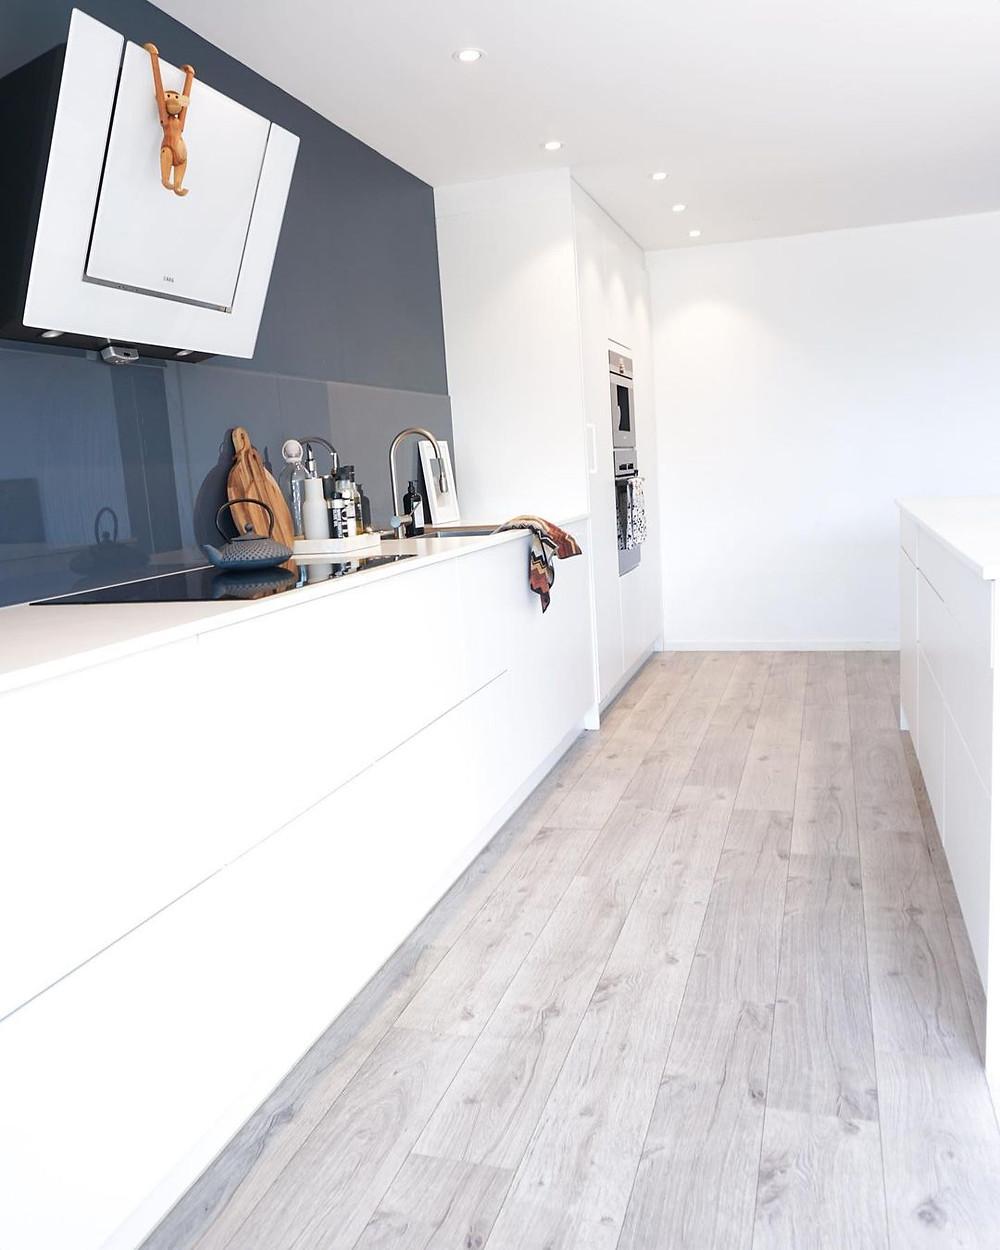 minimalist kitchen with navy blue accents